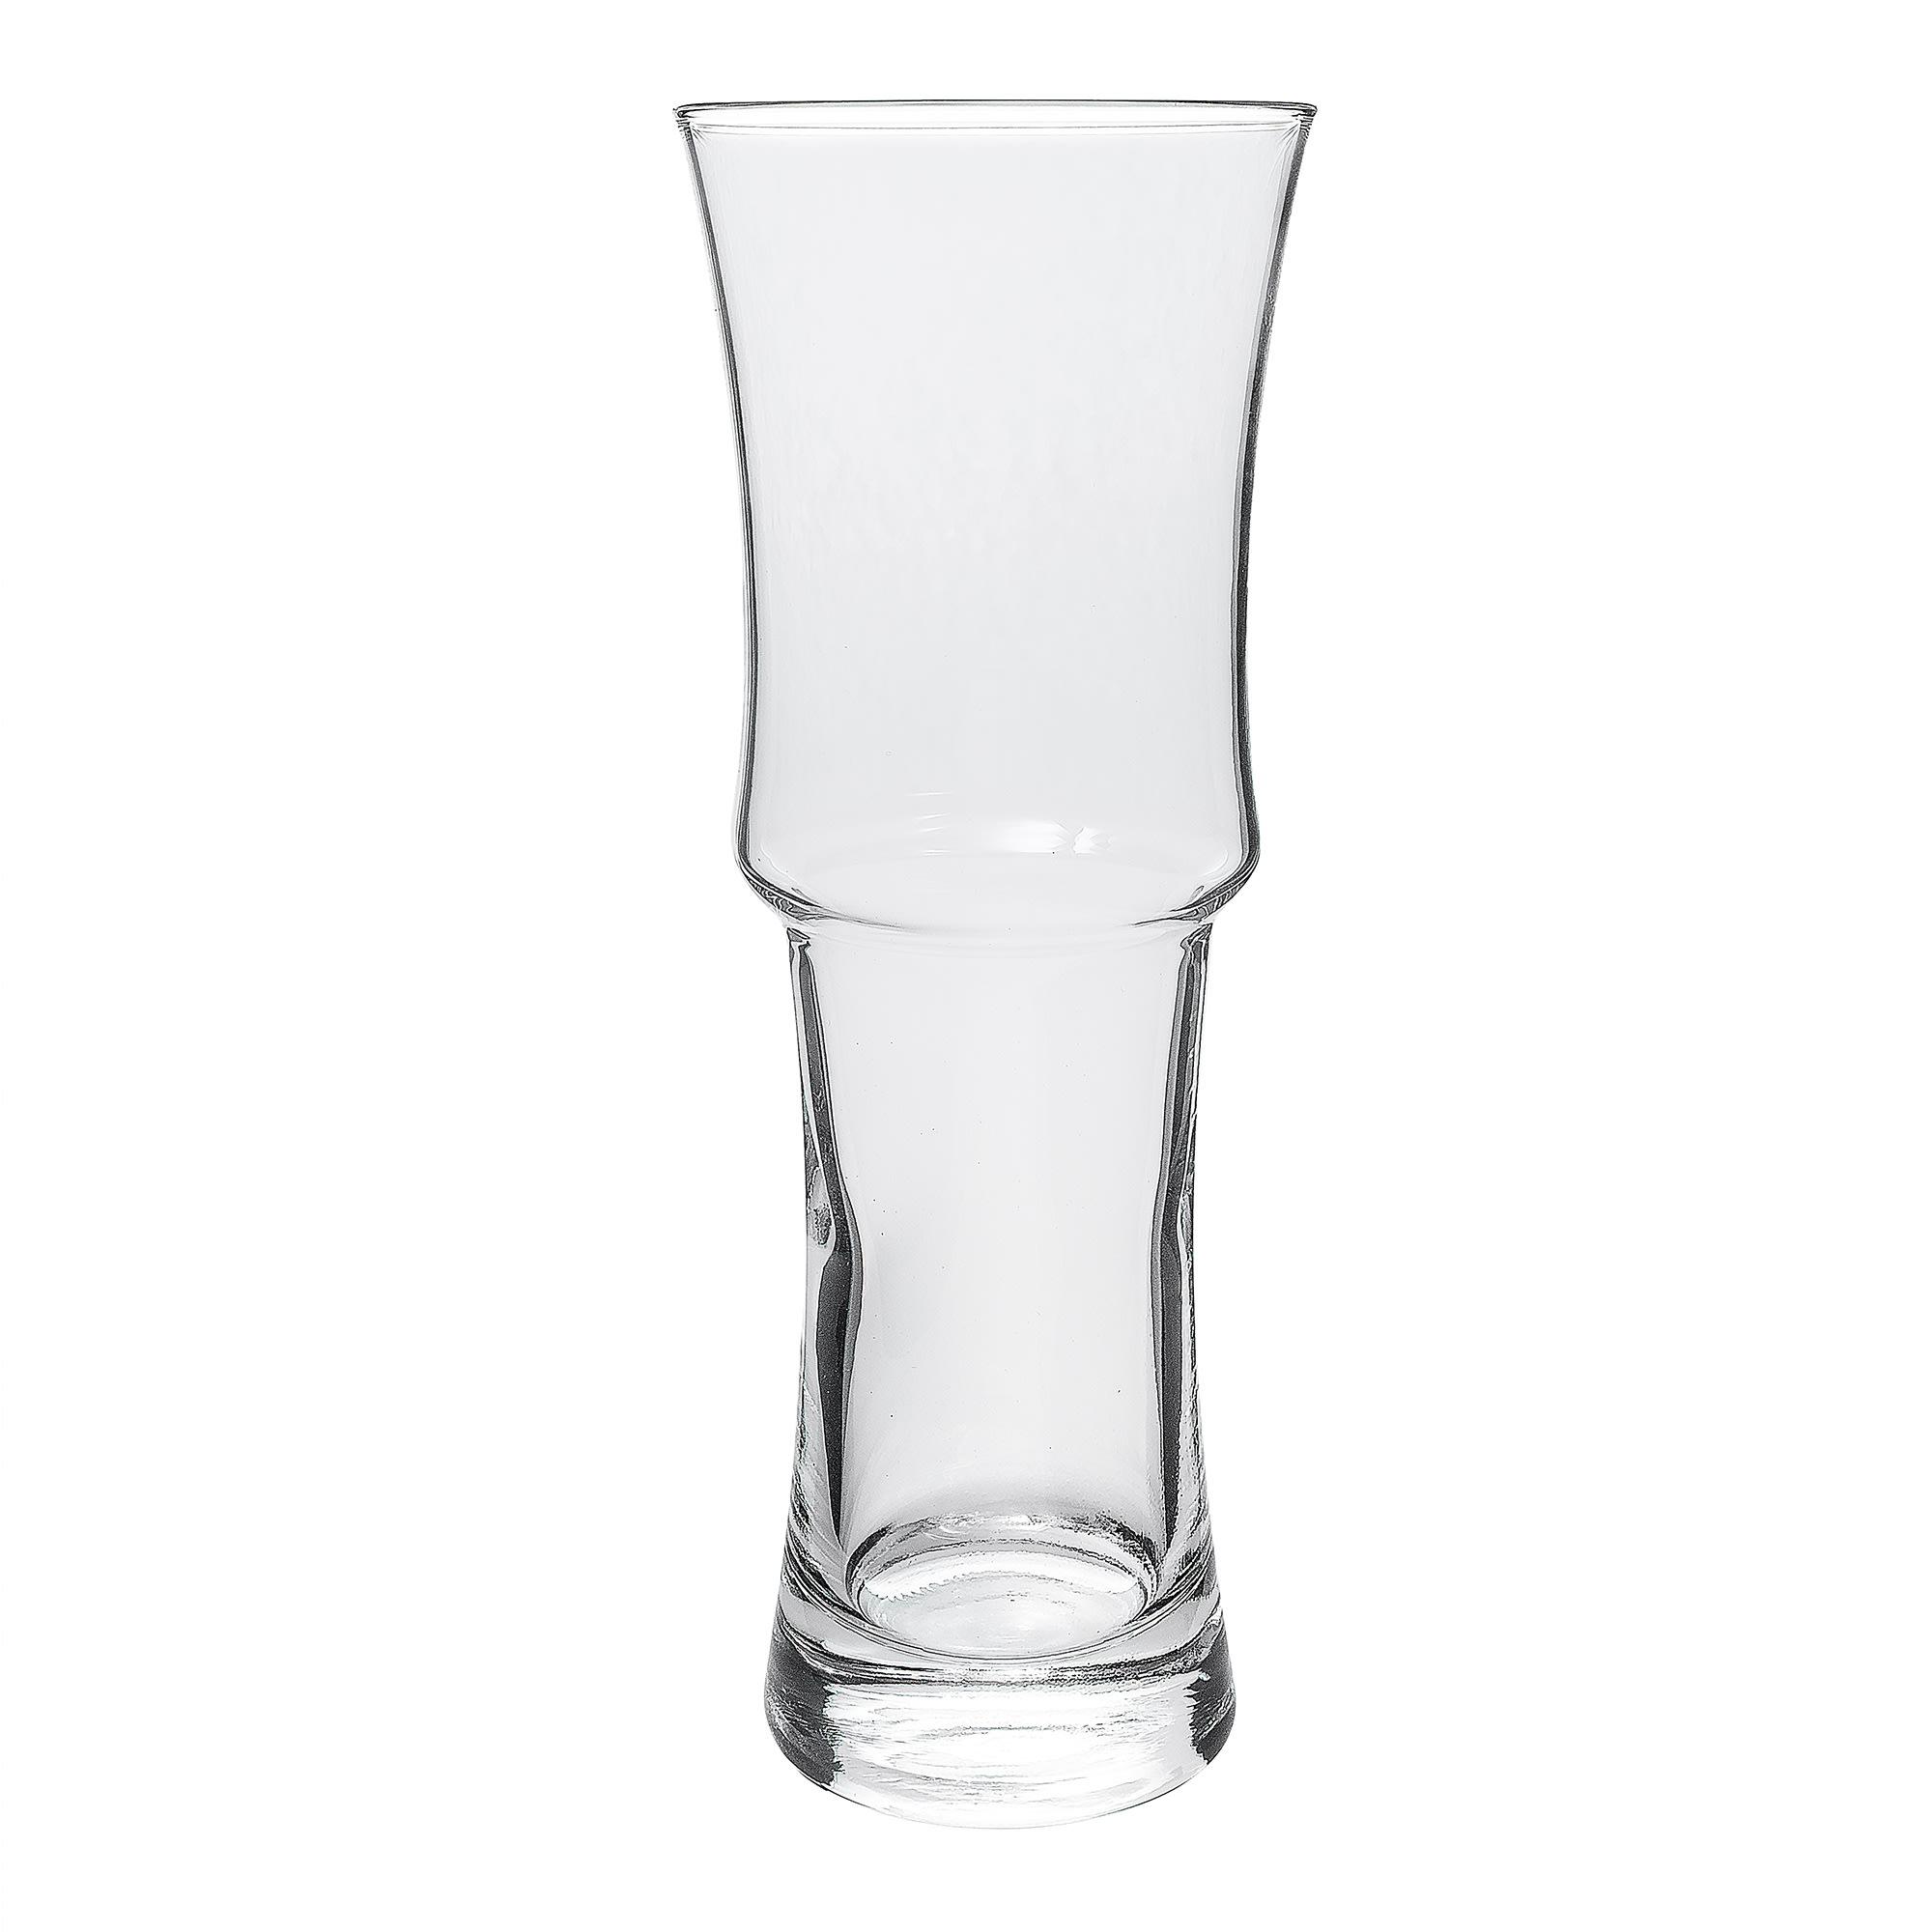 Libbey 1619 155 Oz Napoli Grande Footed Hurricane Glass Safedge Rim